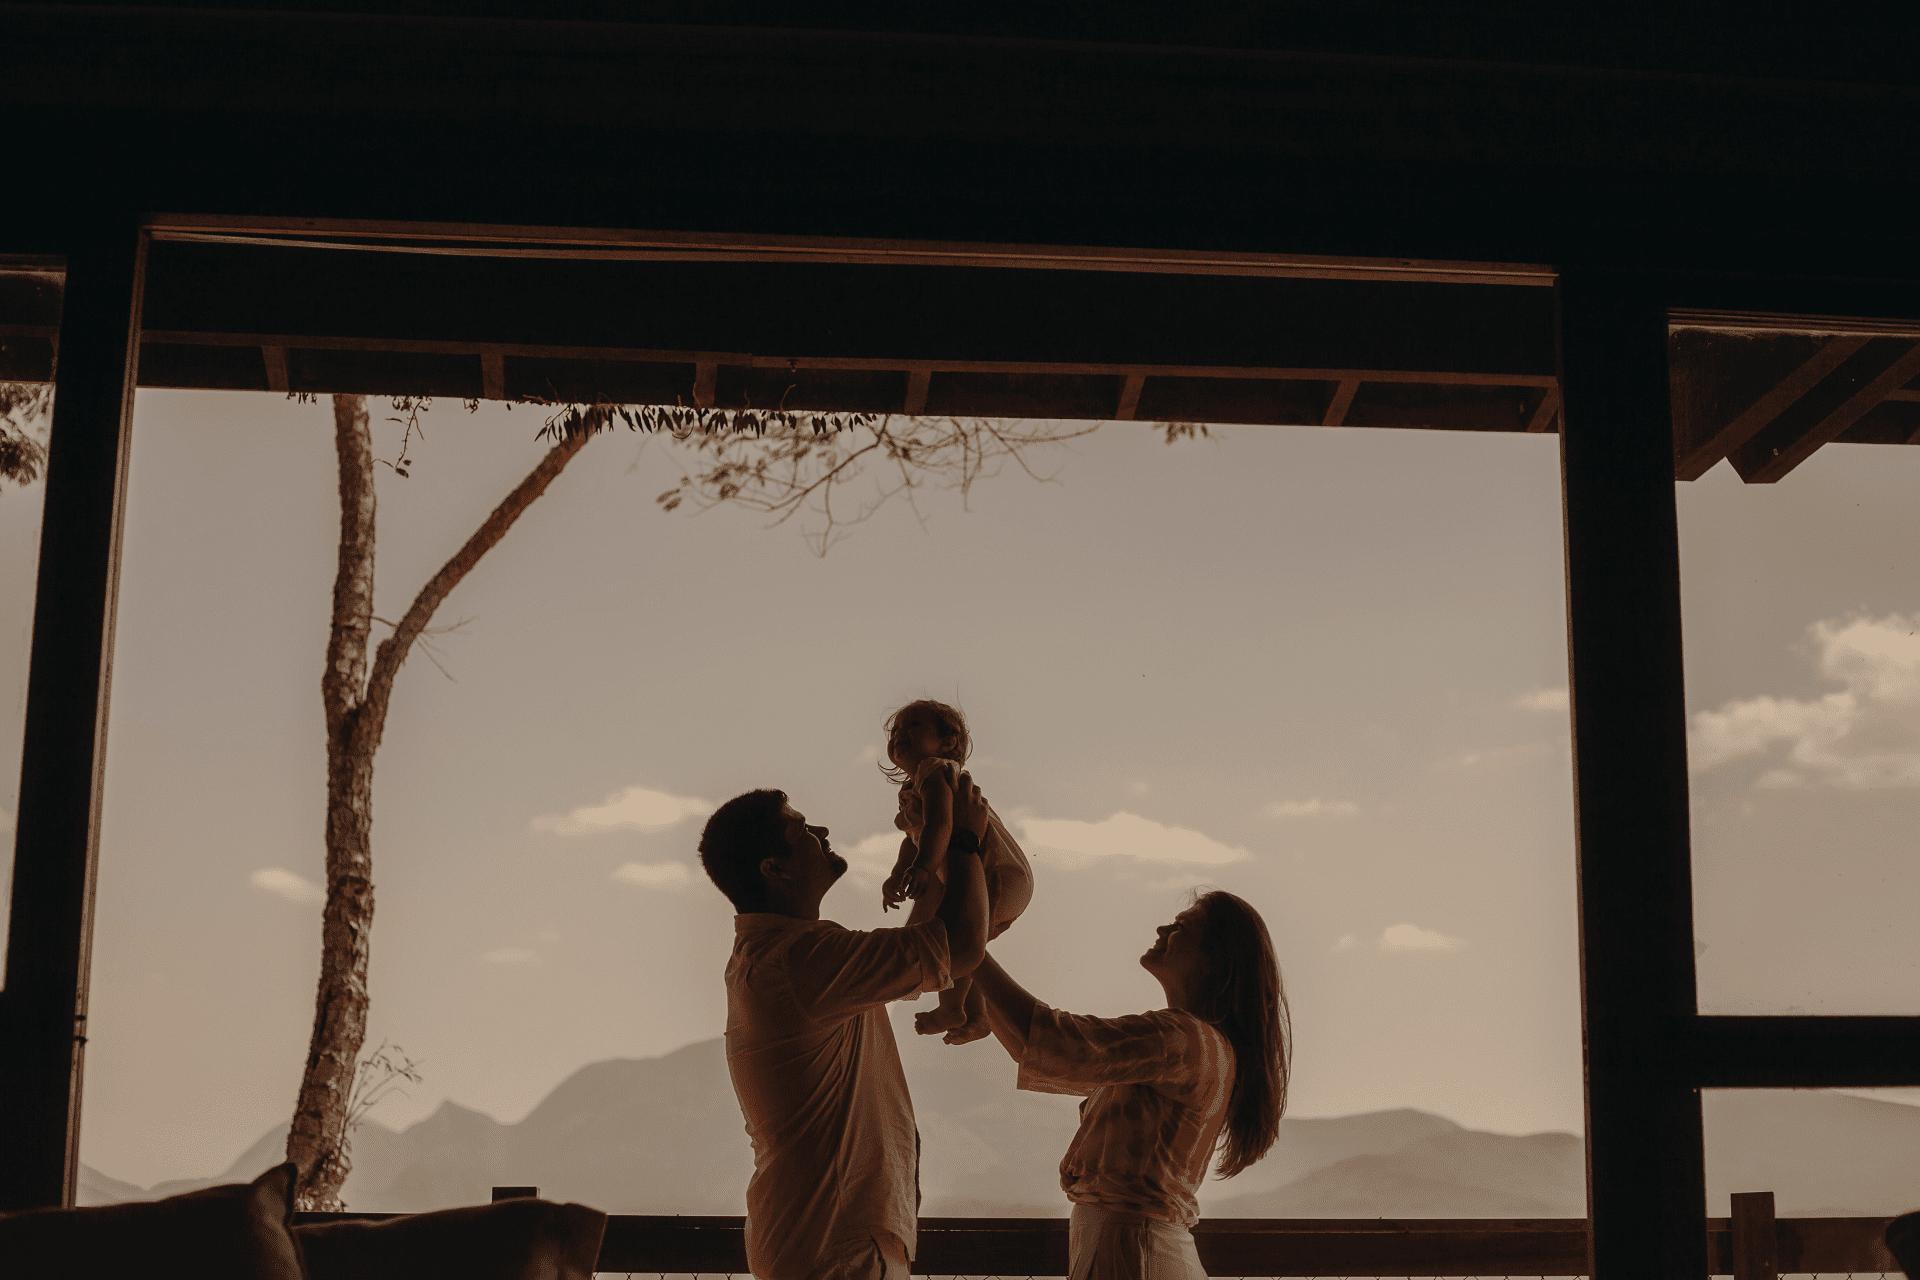 equal shared parental responsibility